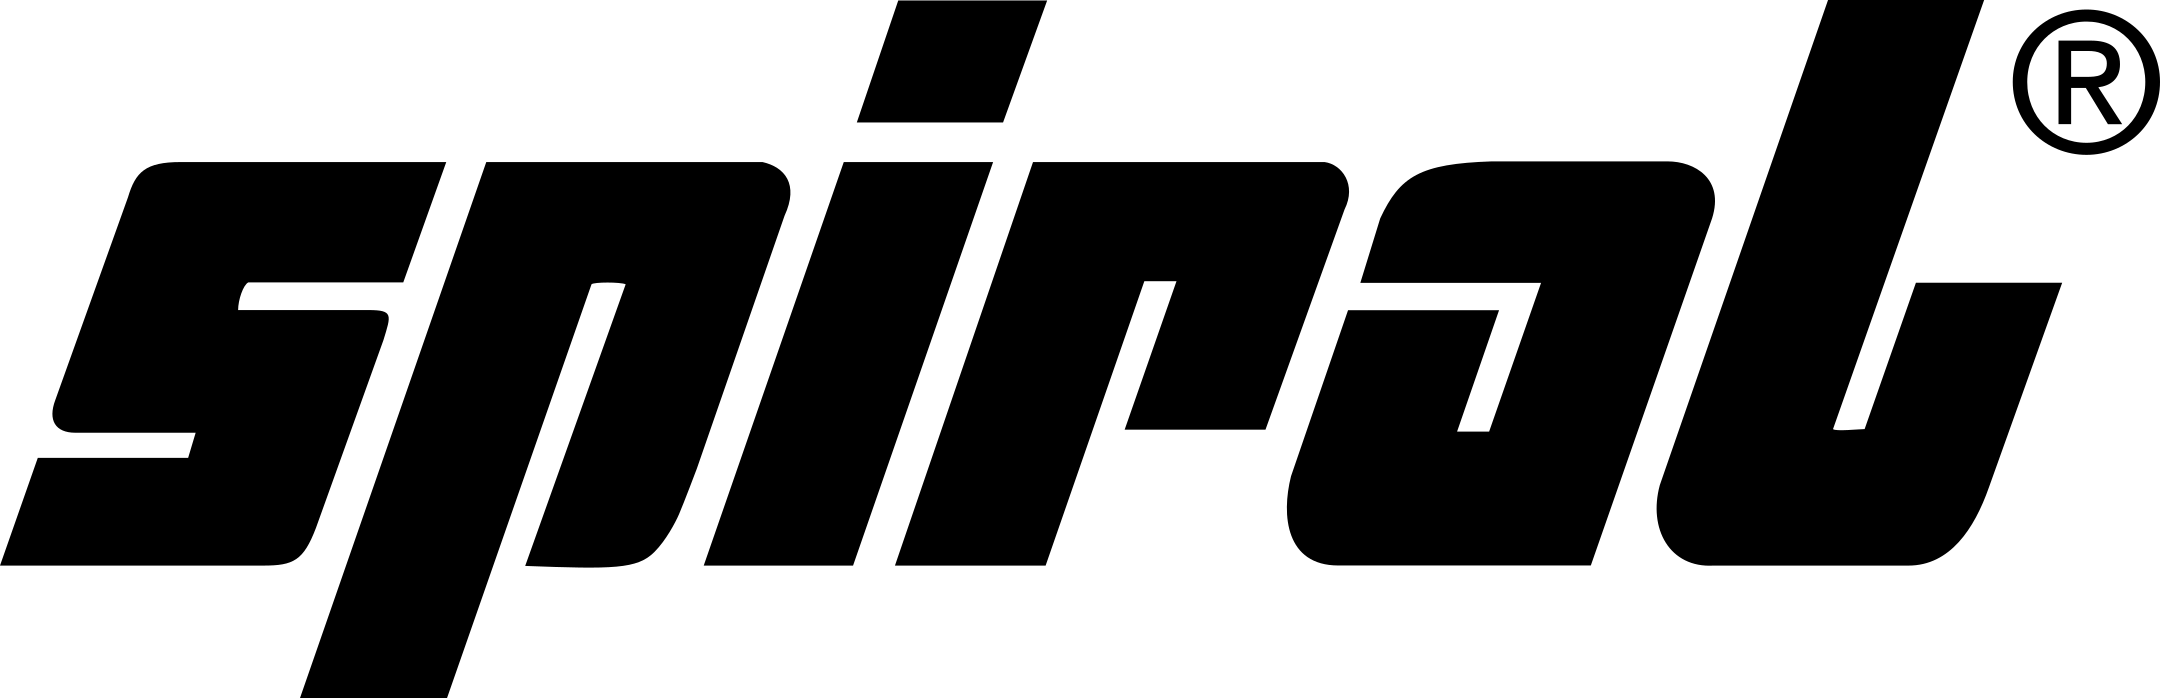 spiral logo 1 - Spiral Logo